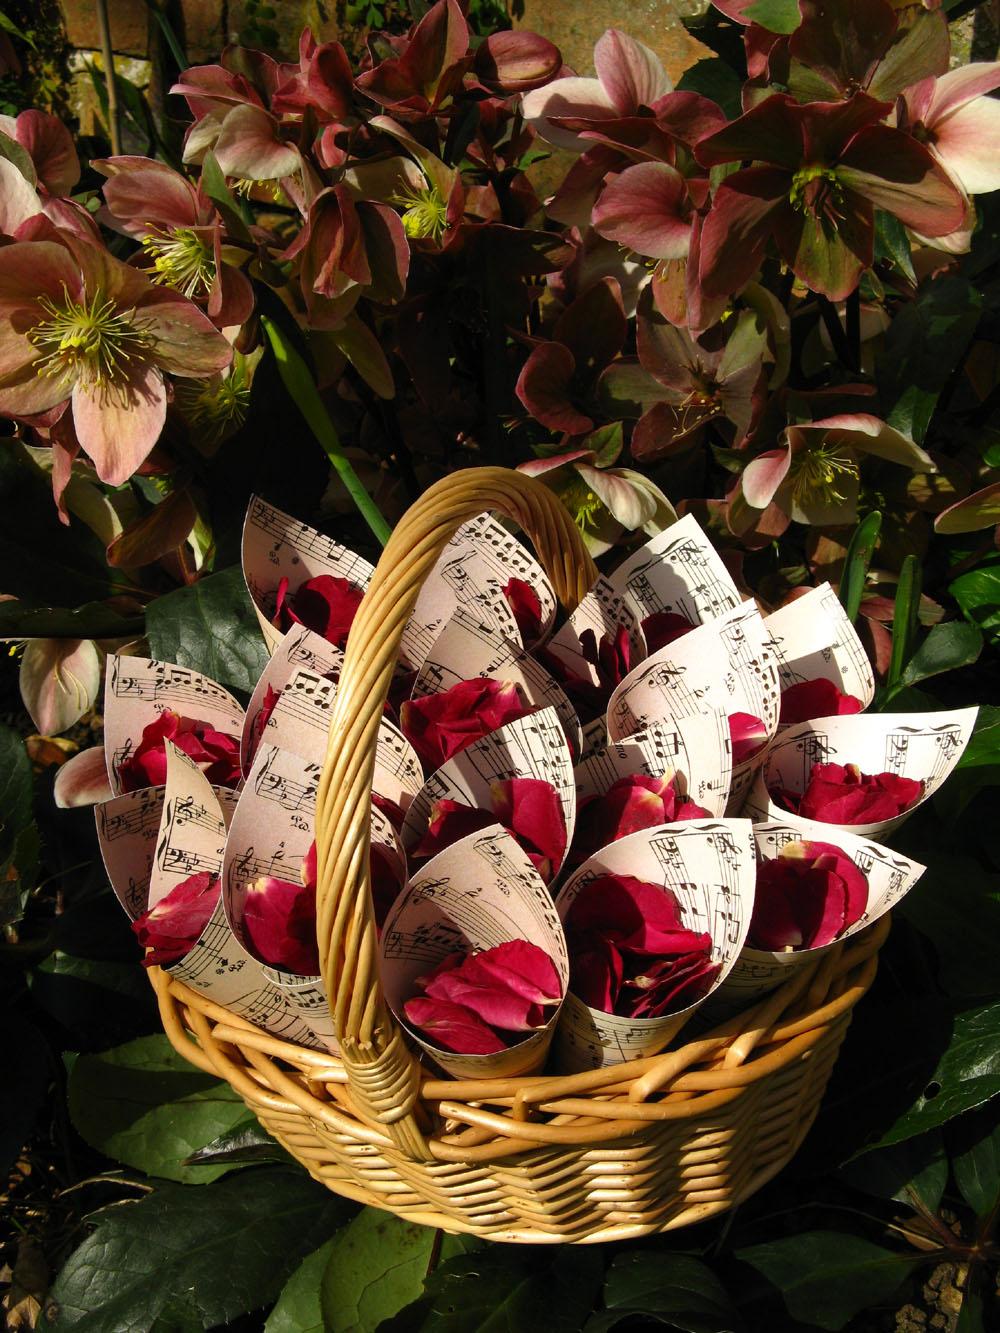 Flower Girl Baskets - merlot rose petals in music paper confetti cones